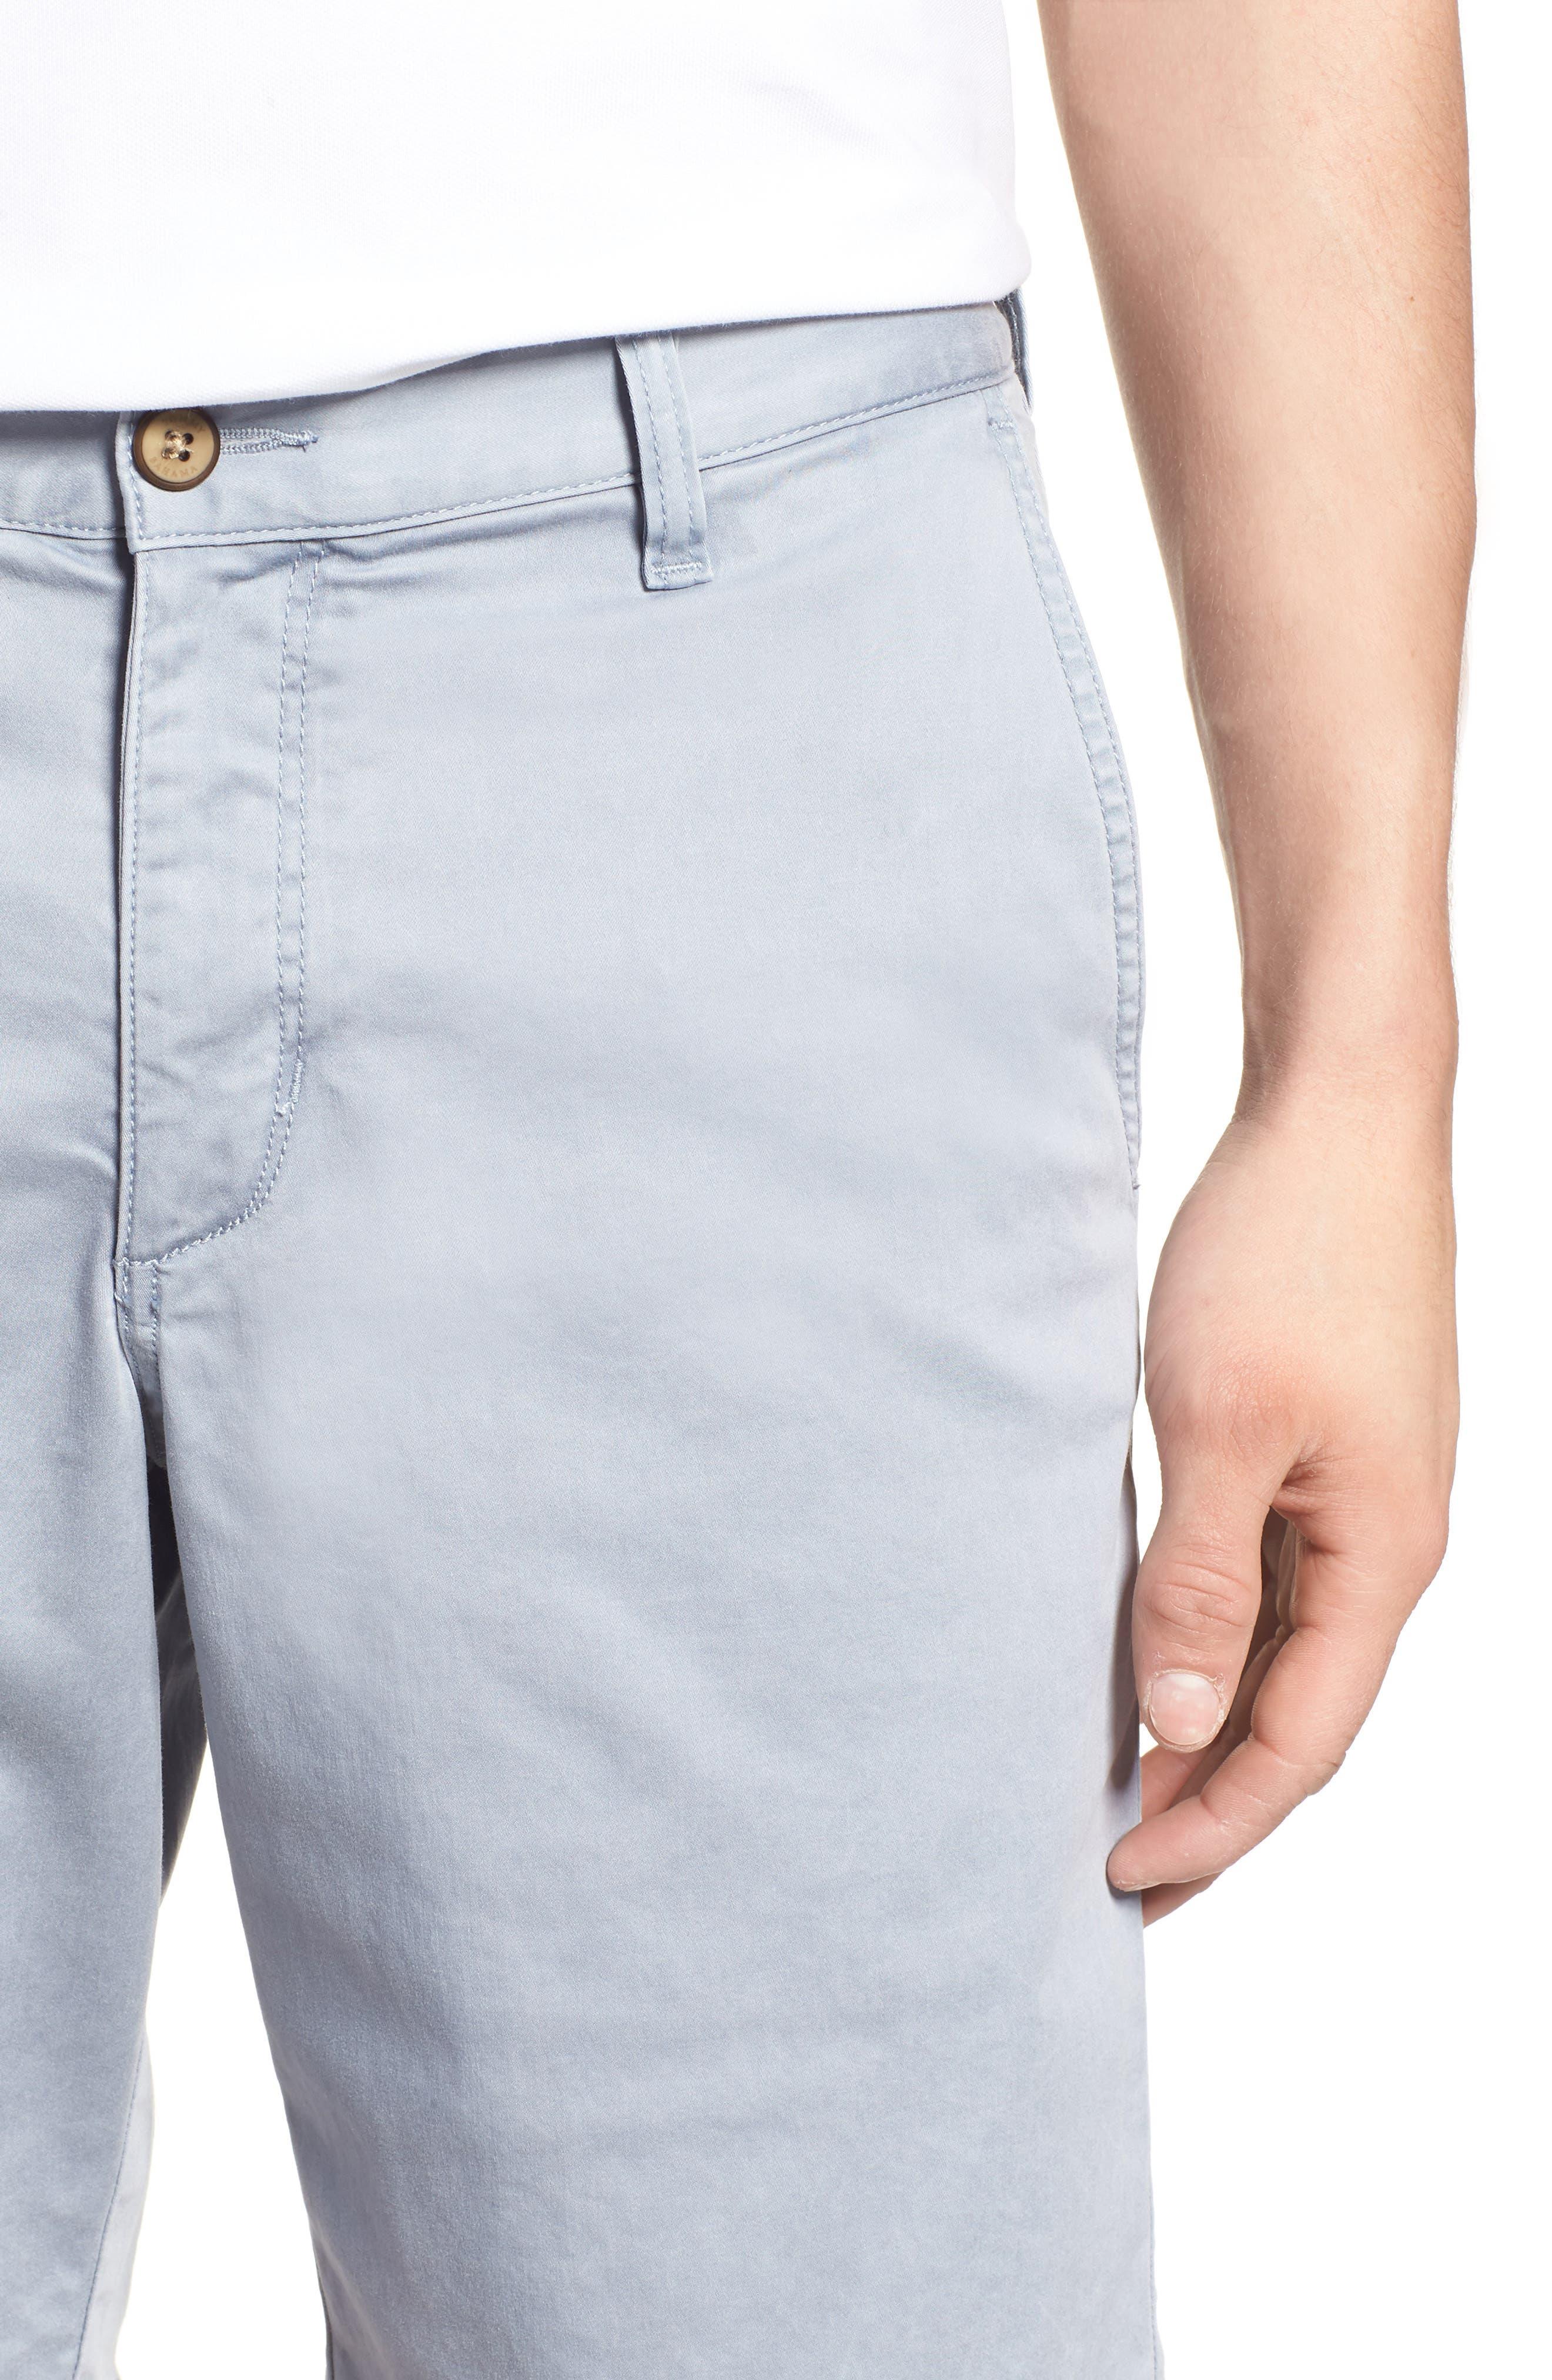 Boracay Chino Shorts,                             Alternate thumbnail 30, color,